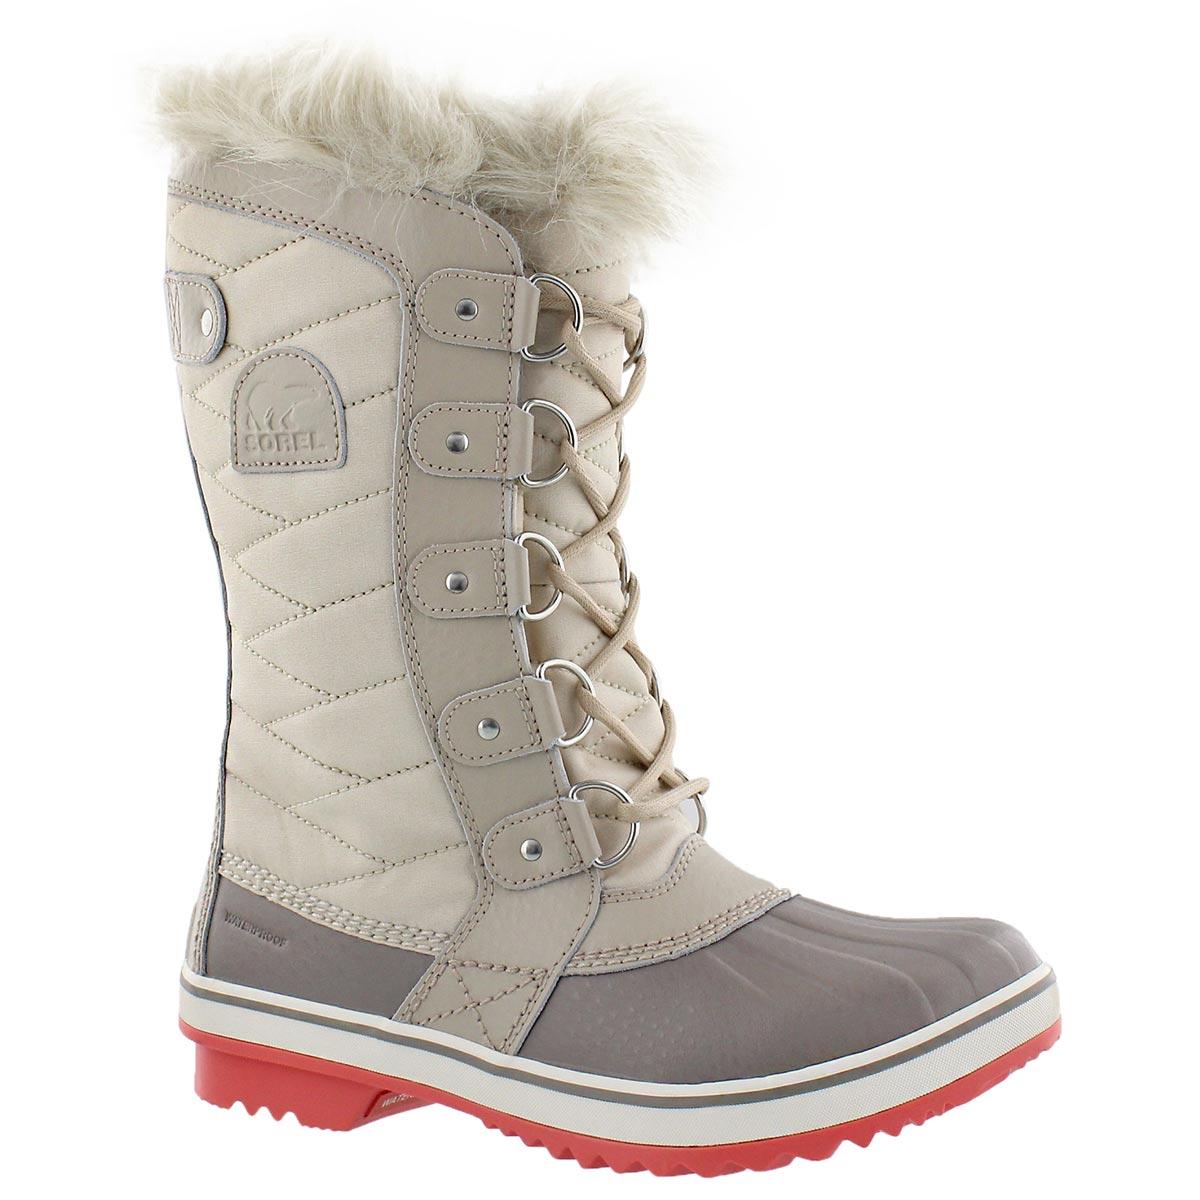 Lds Tofino II fawn wtpf boot